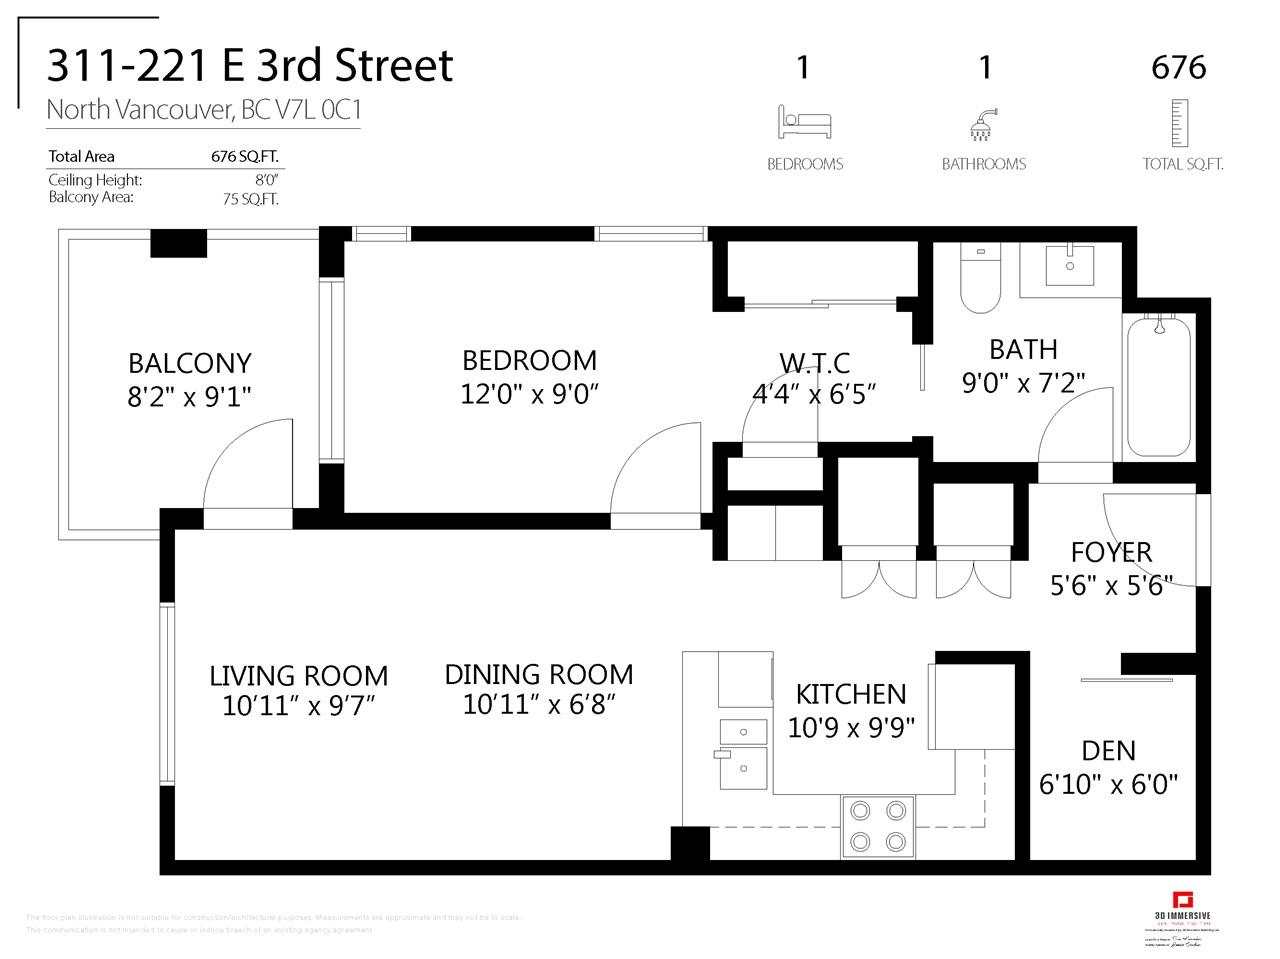 Listing Image of 311 221 E 3RD STREET